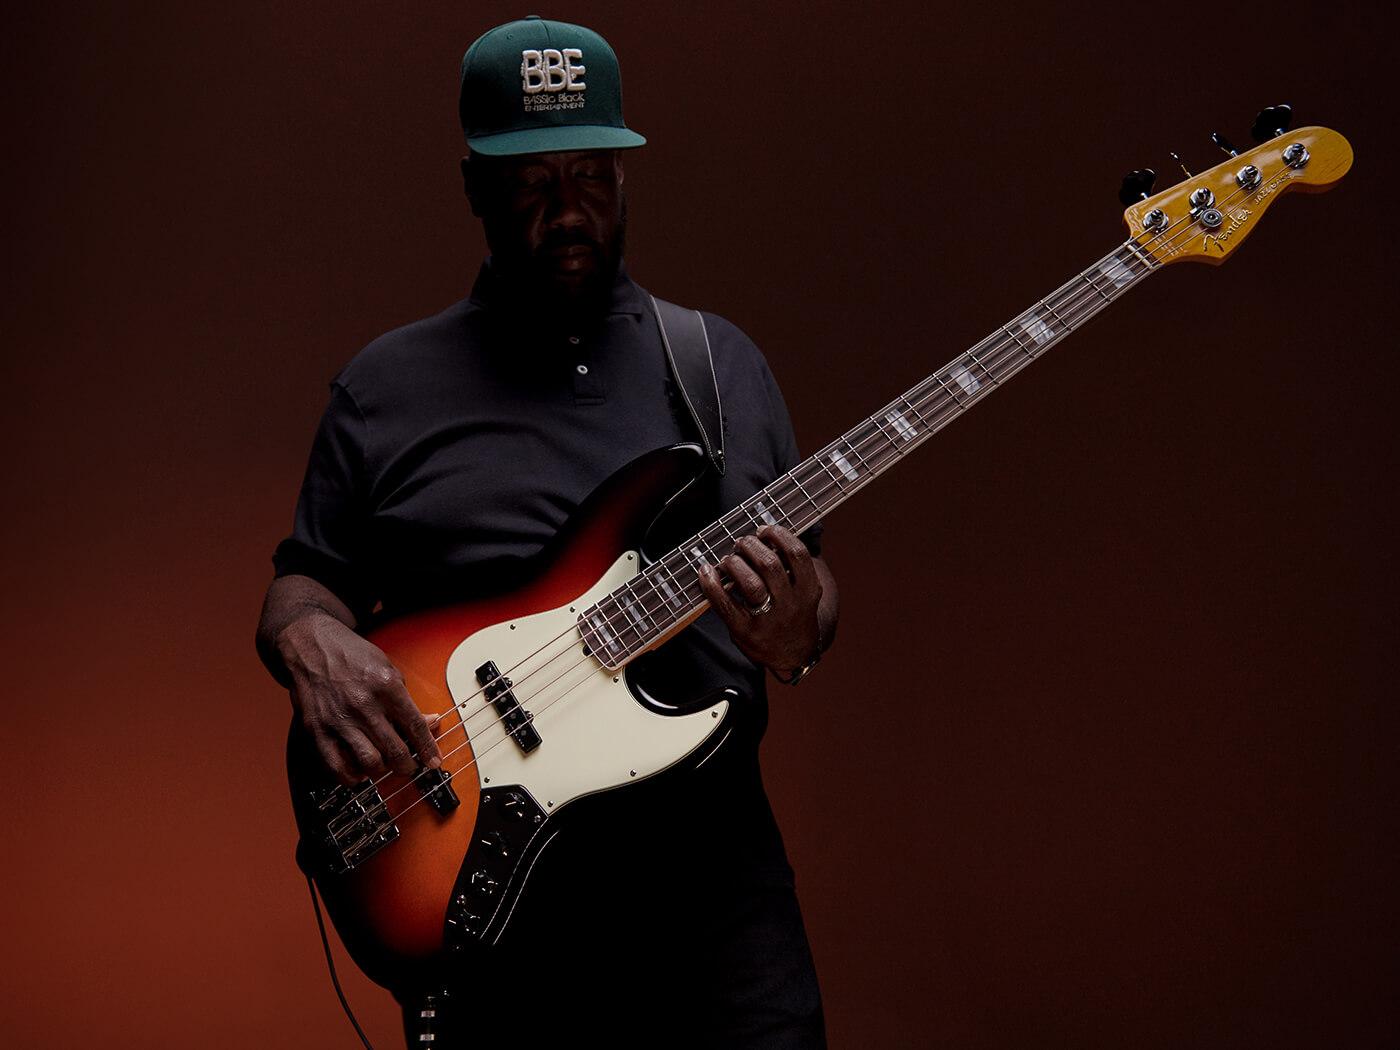 Fender Ultra Adam Blackstone (Jazz Bass)